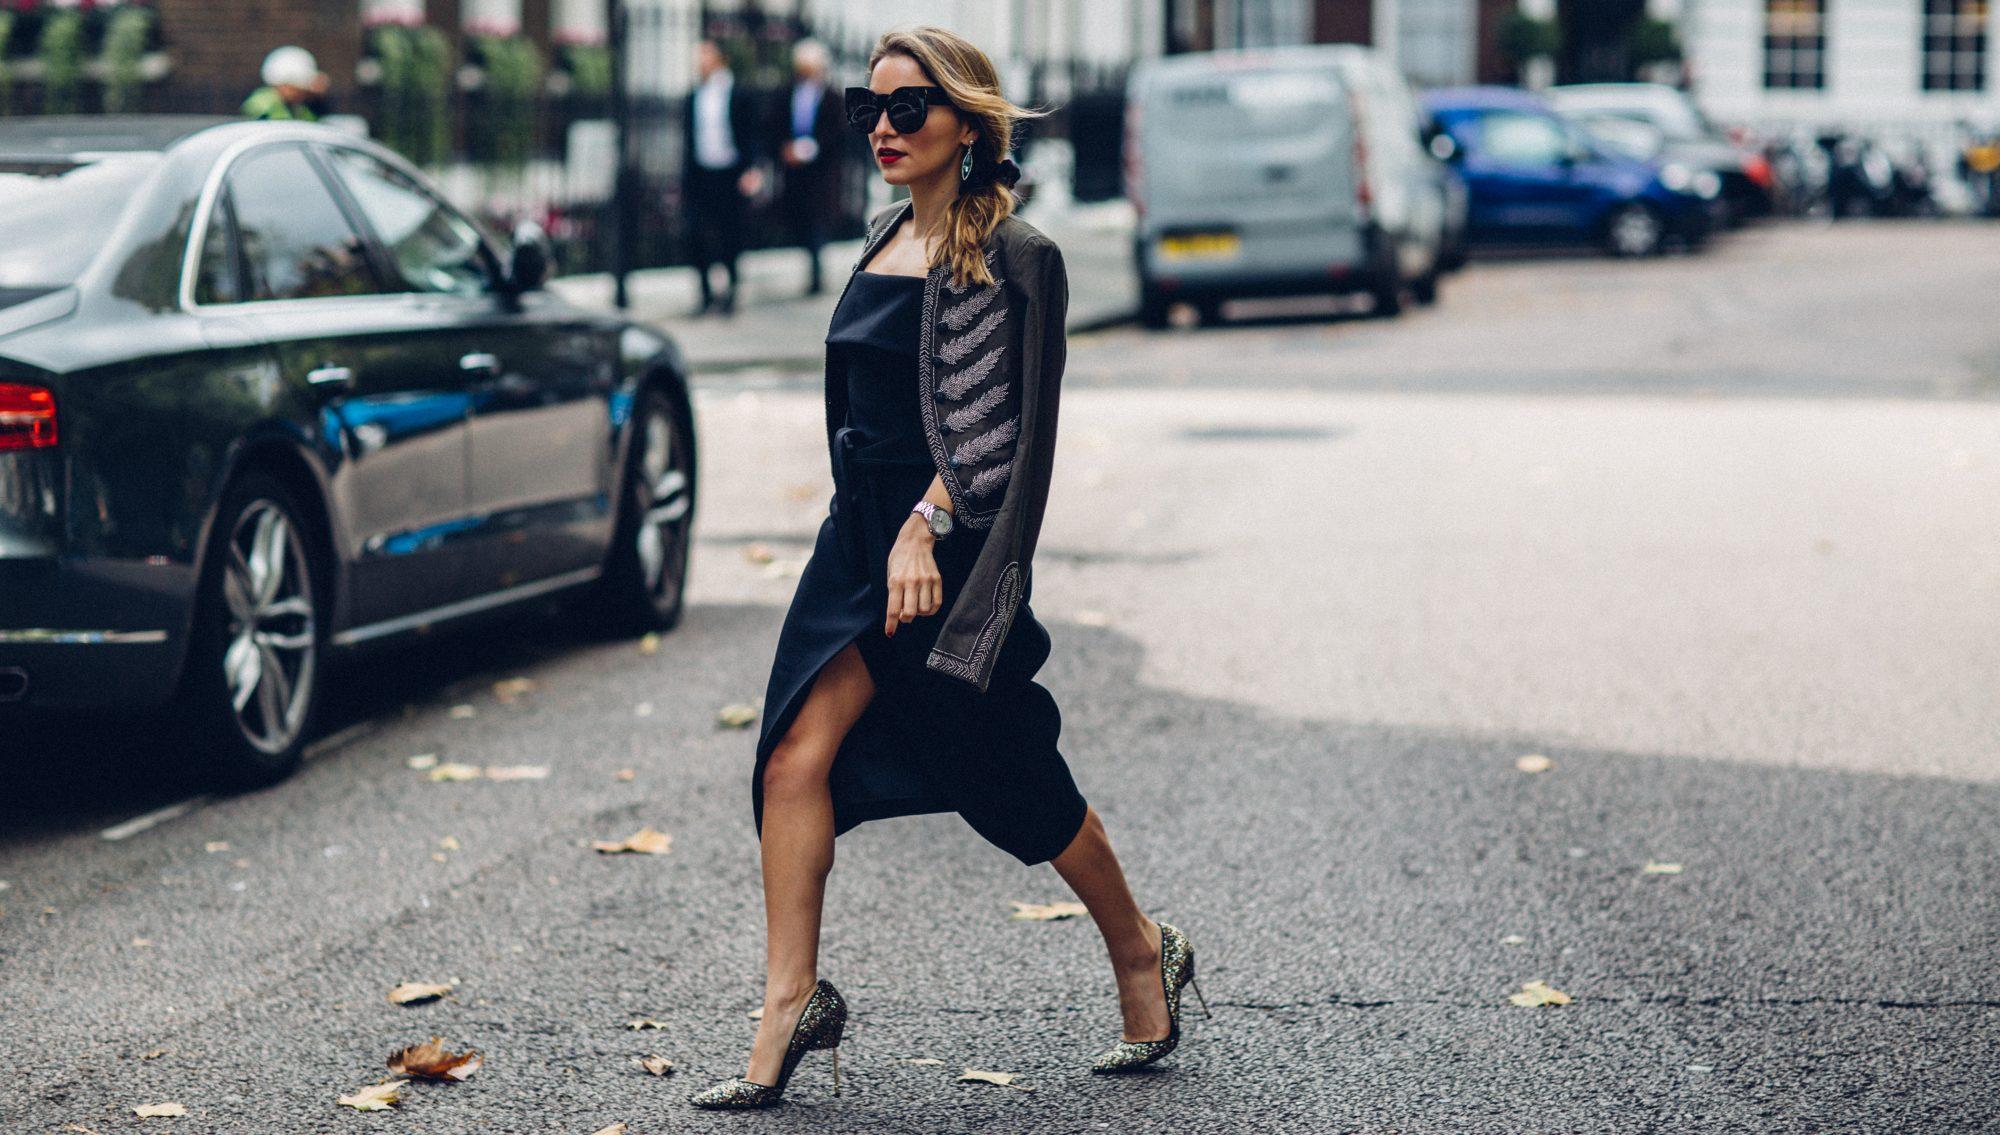 Whitney's Wonderland UK & NYC Top Fashion Blogger wears Lipsy London LBD and Free People military jacket